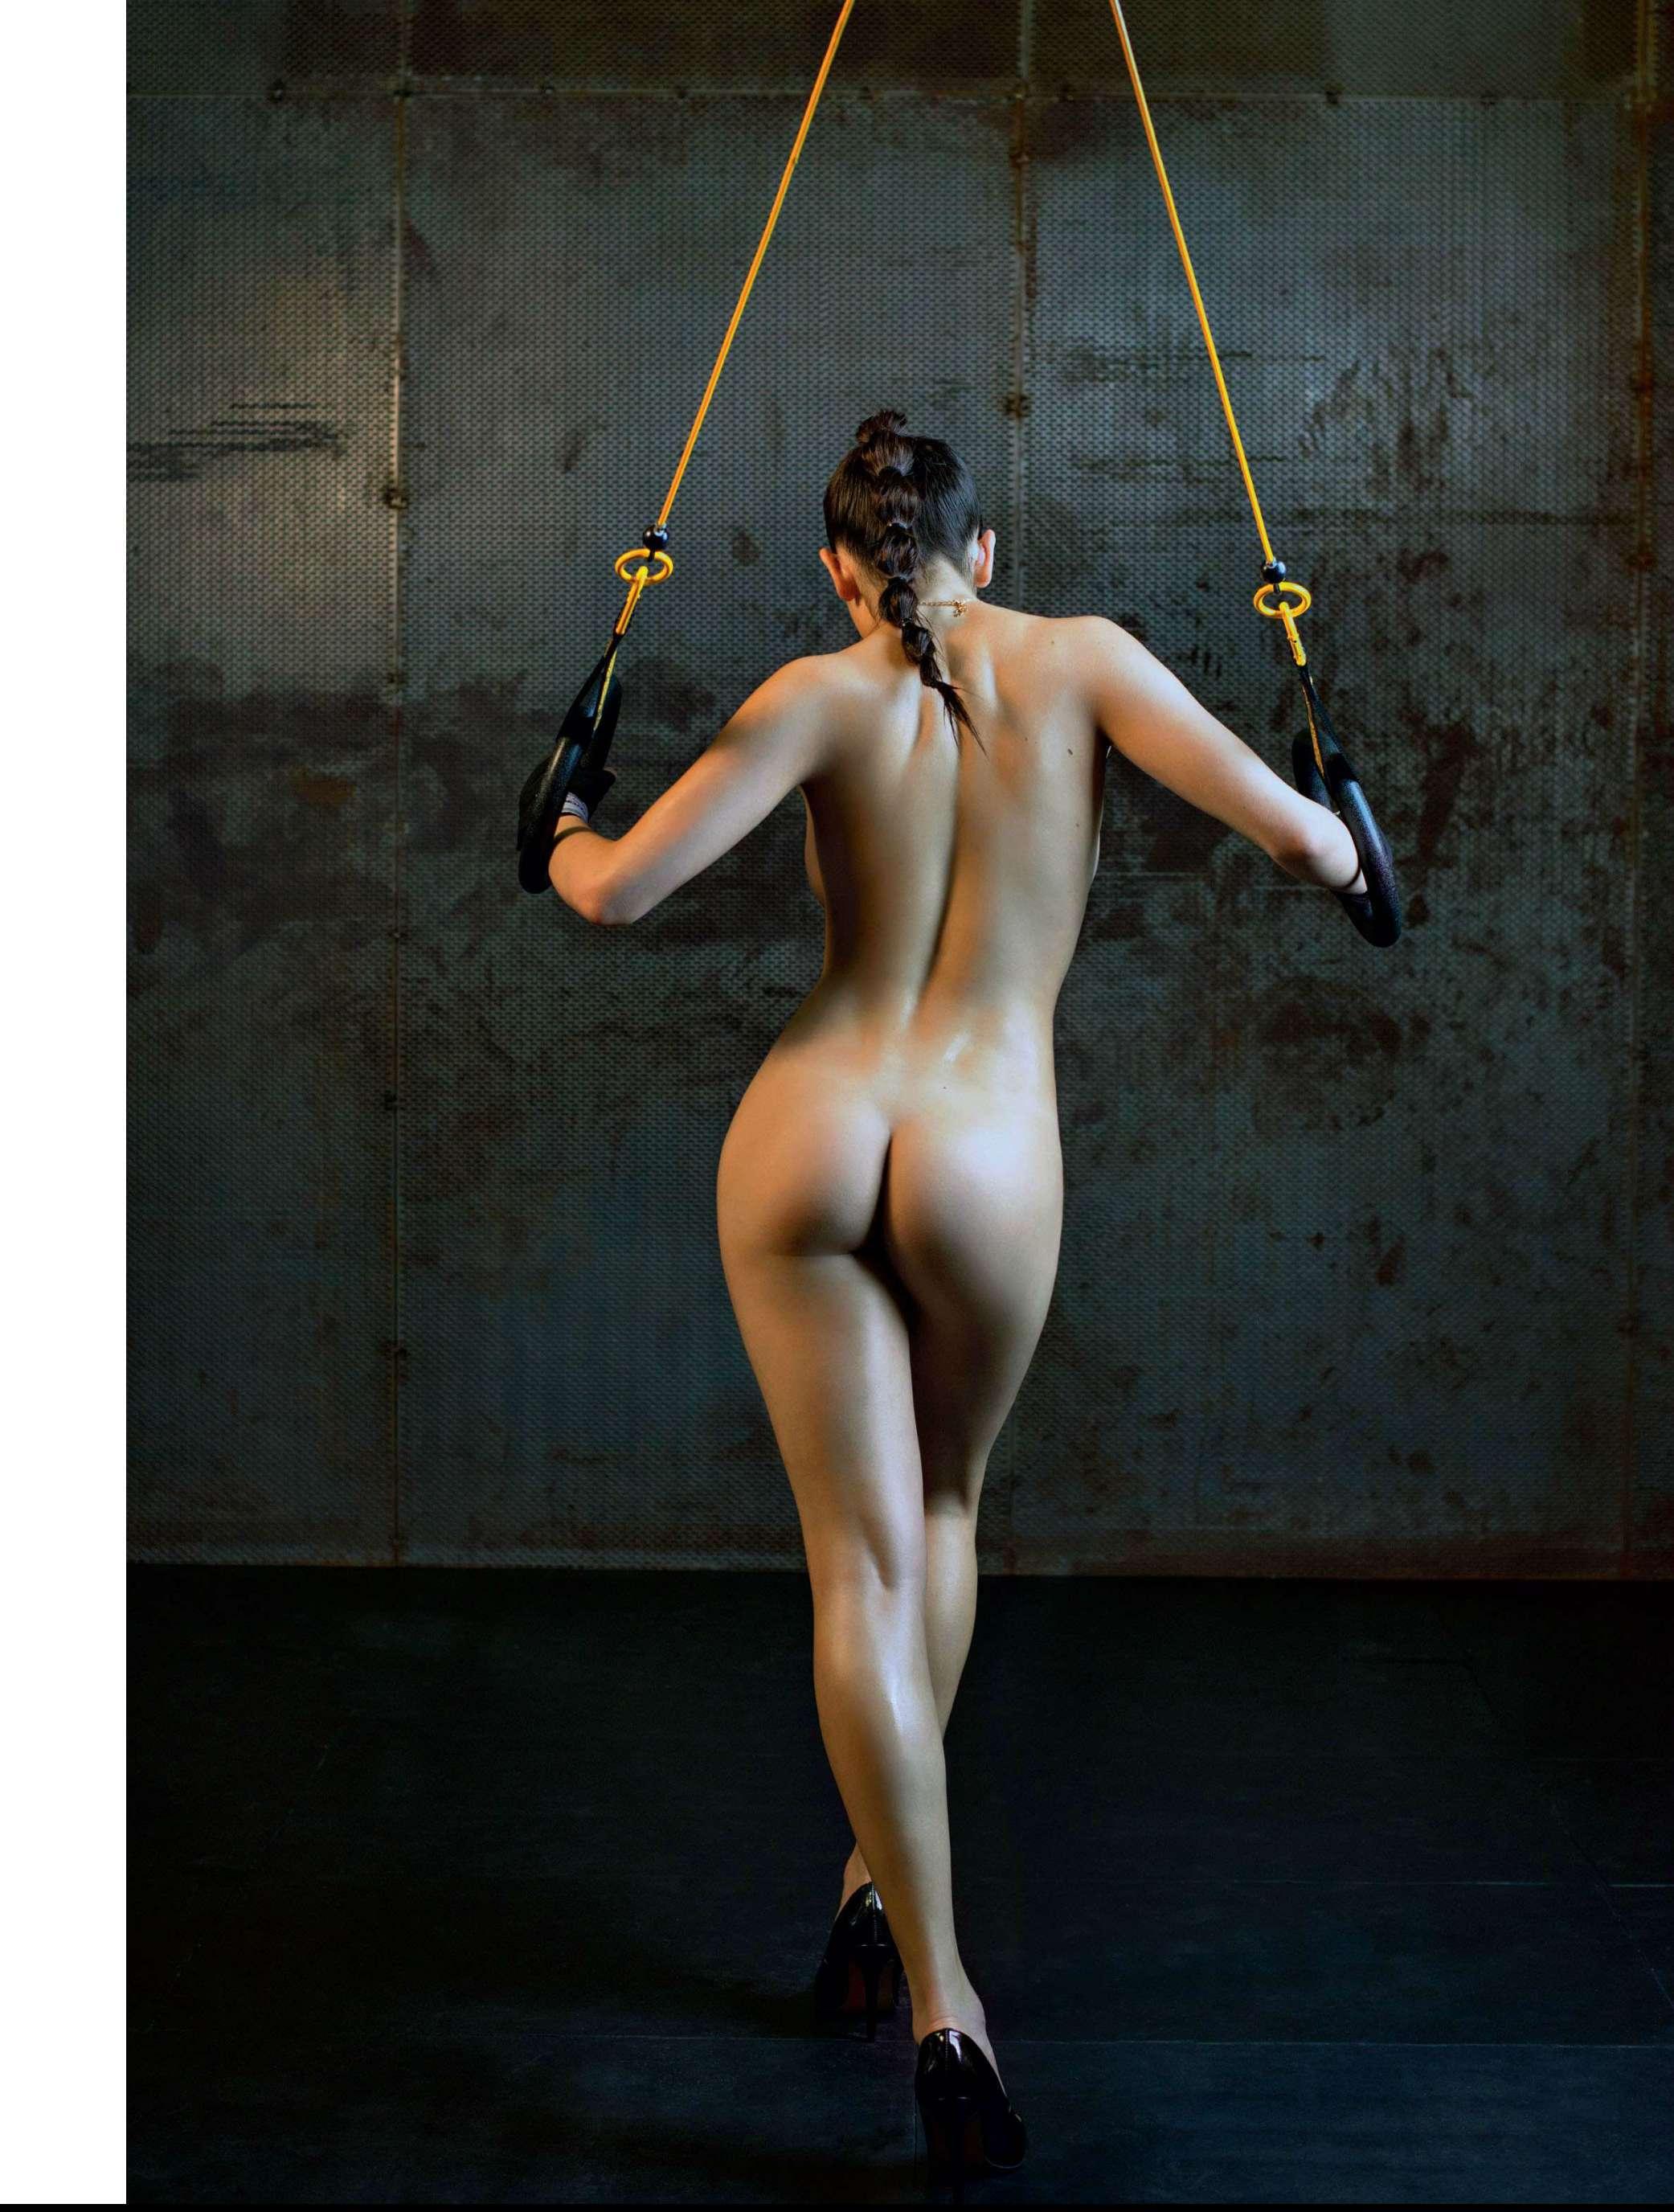 Эротика в спорти 1 фотография